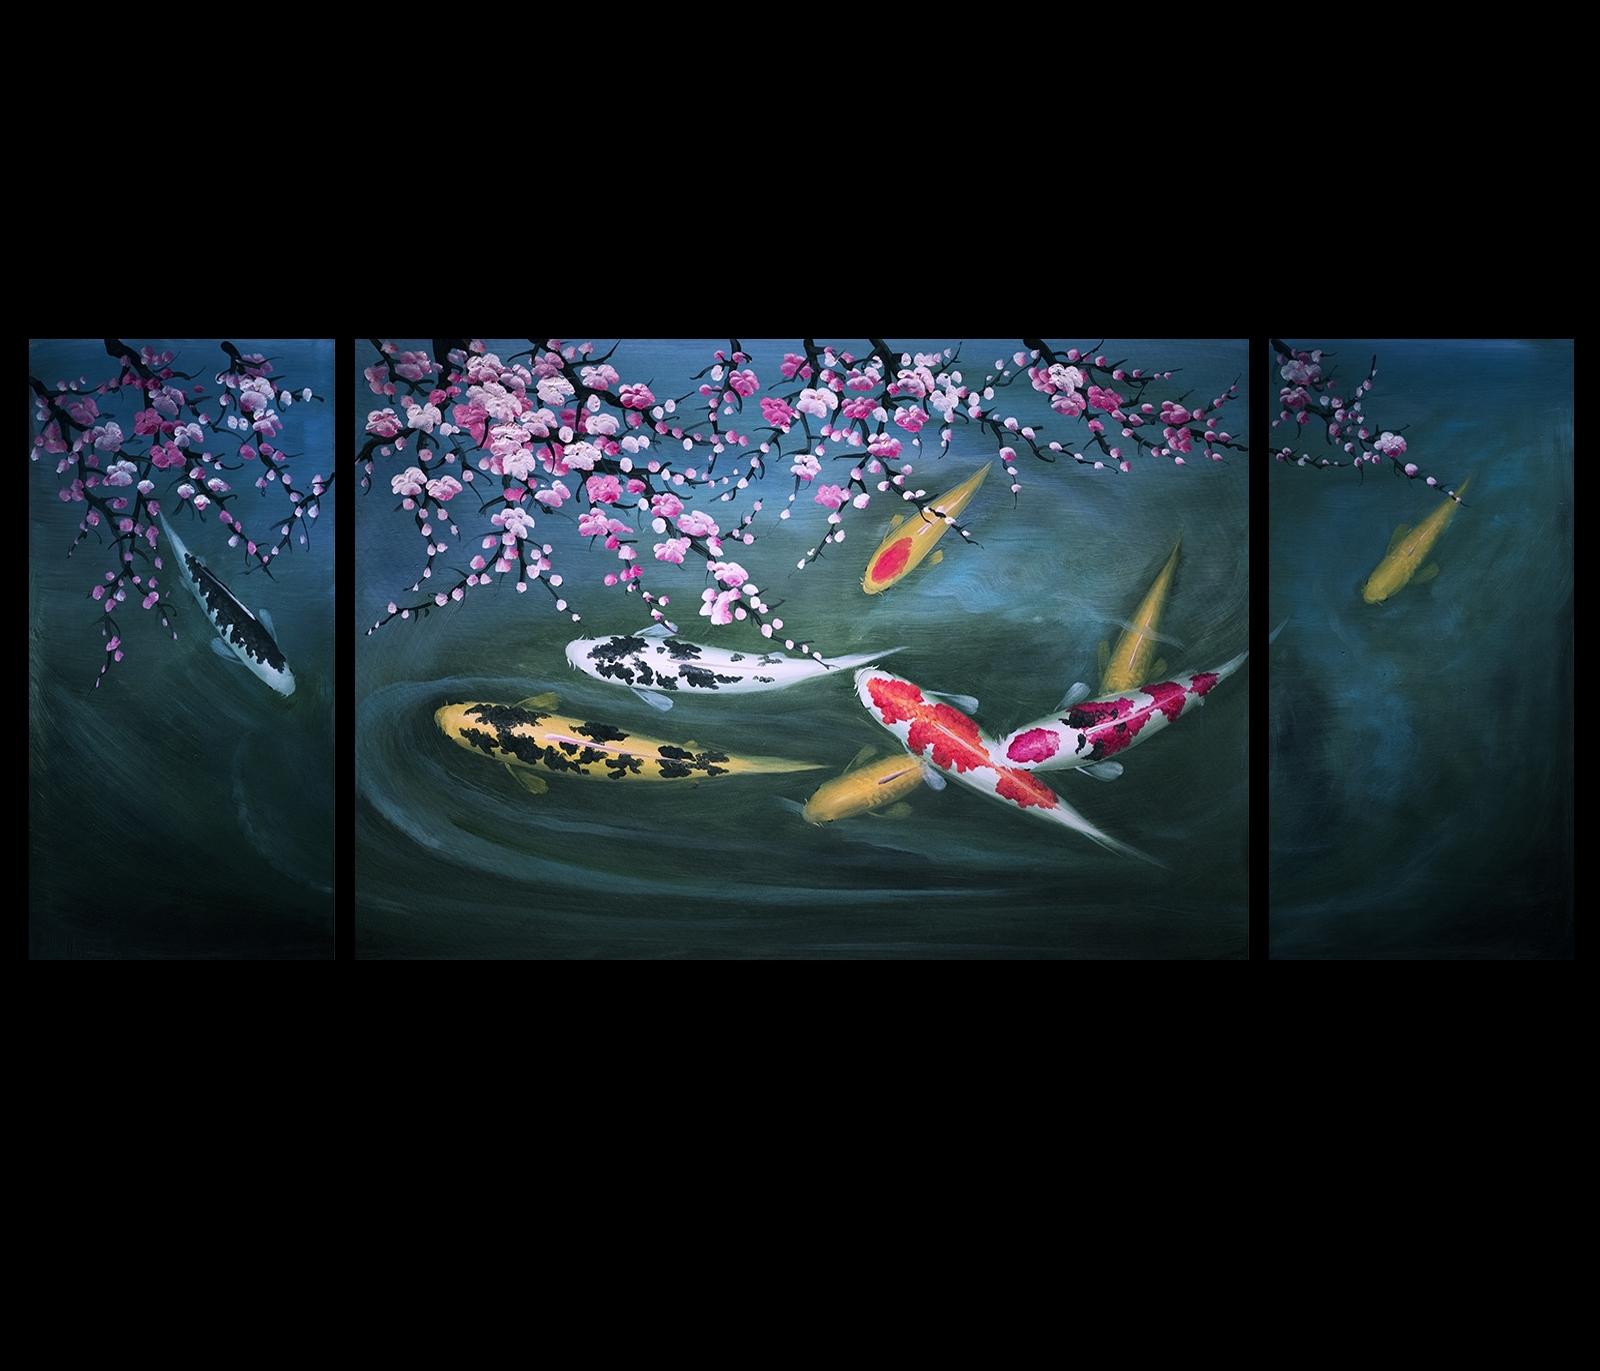 Abstract Art Koi Fish Painting Chinese Feng Shui Art Koi Painting Pertaining To Current Abstract Fish Wall Art (View 4 of 20)